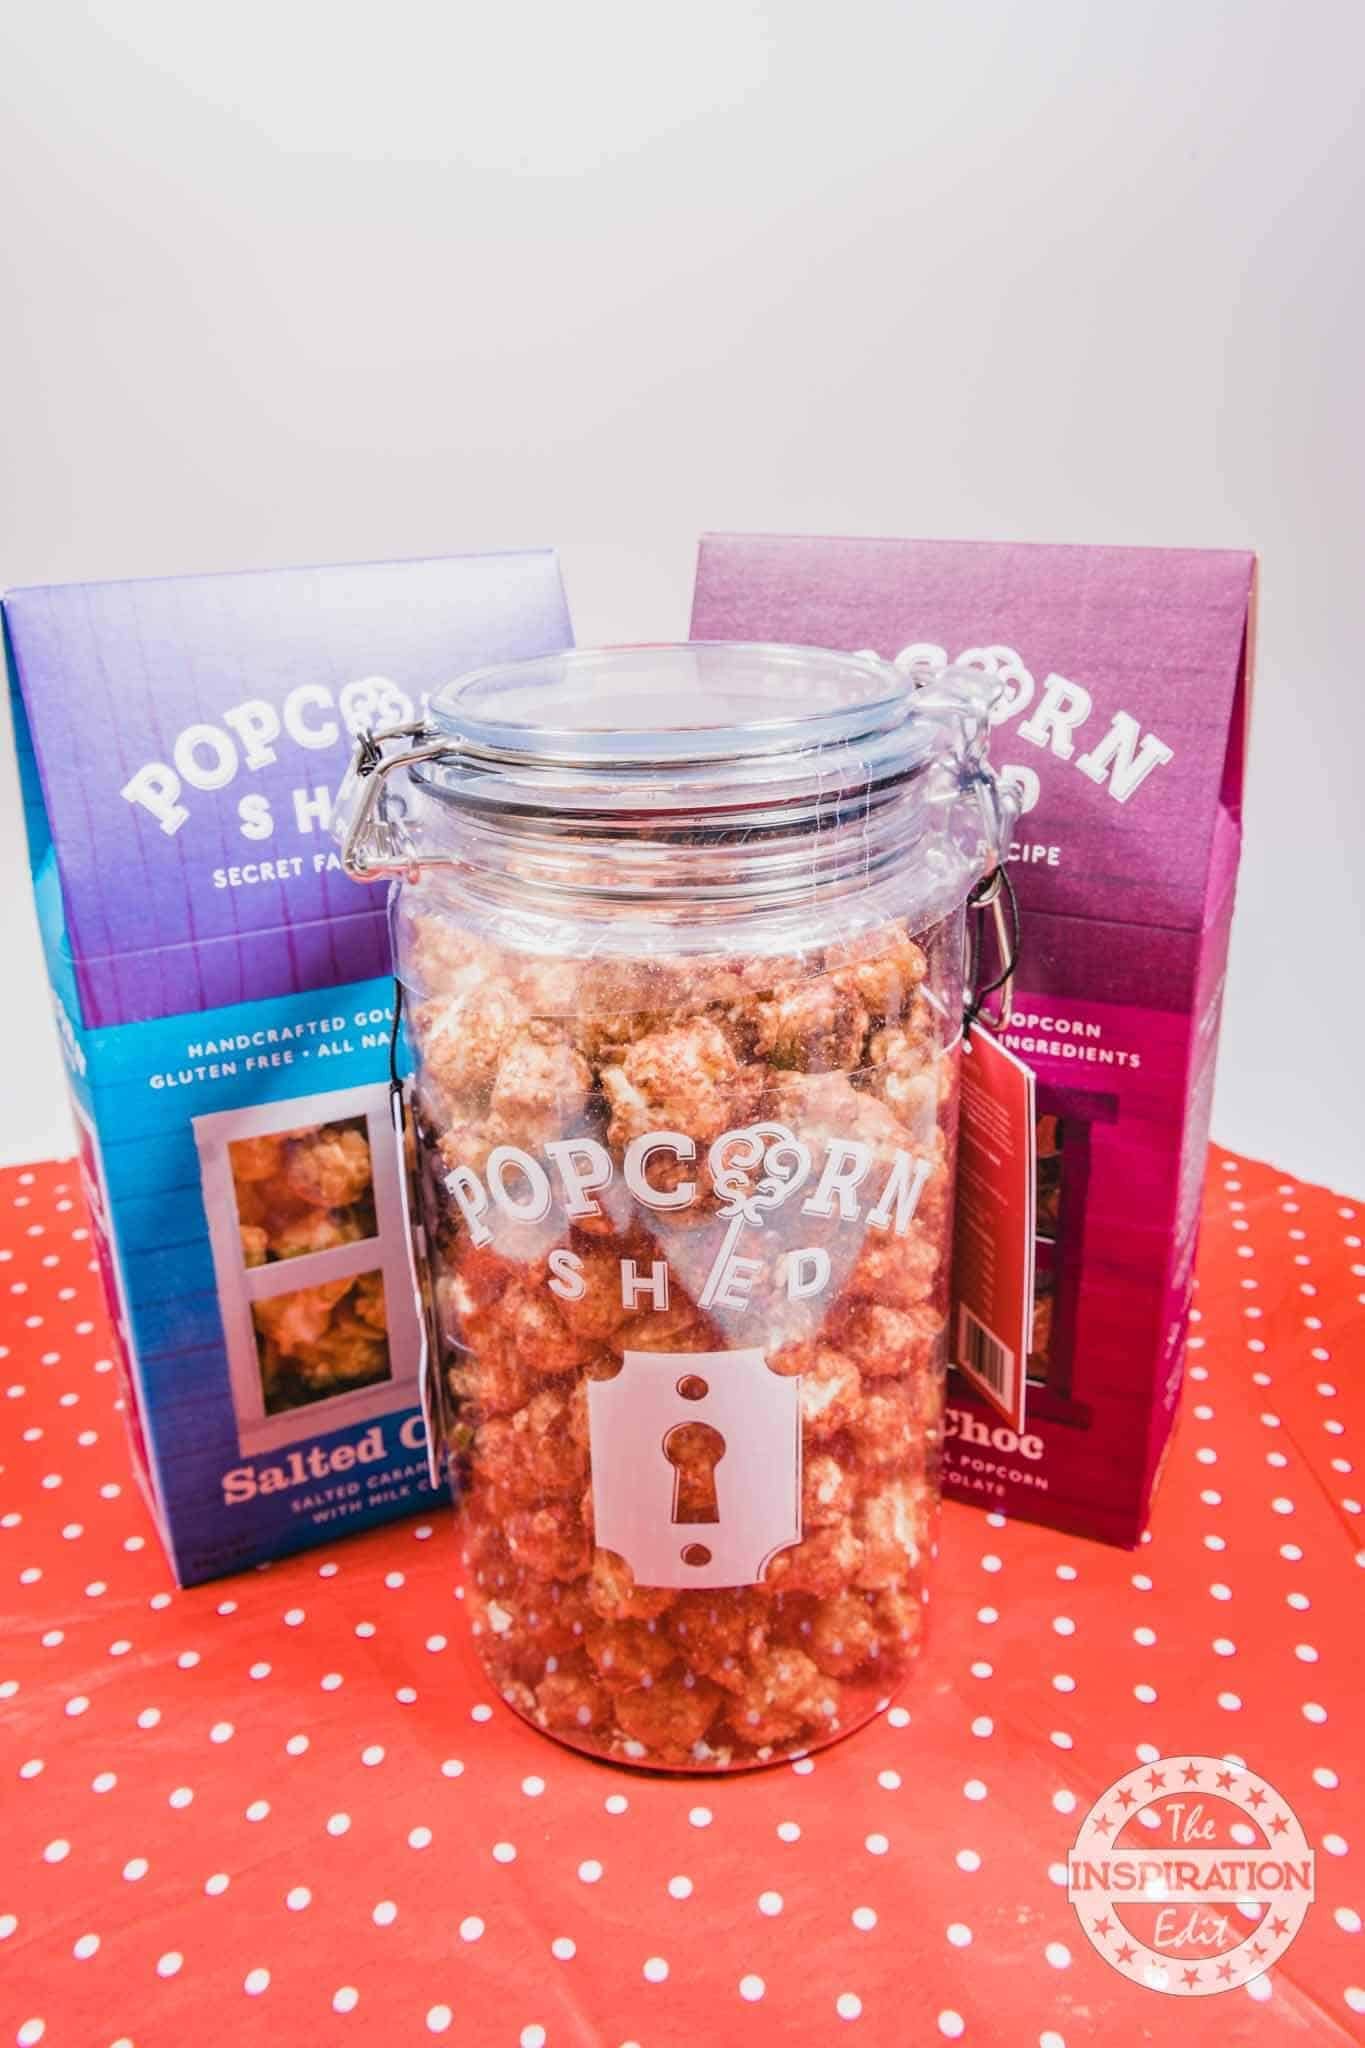 Popcorn Shed Valentines Popcorn